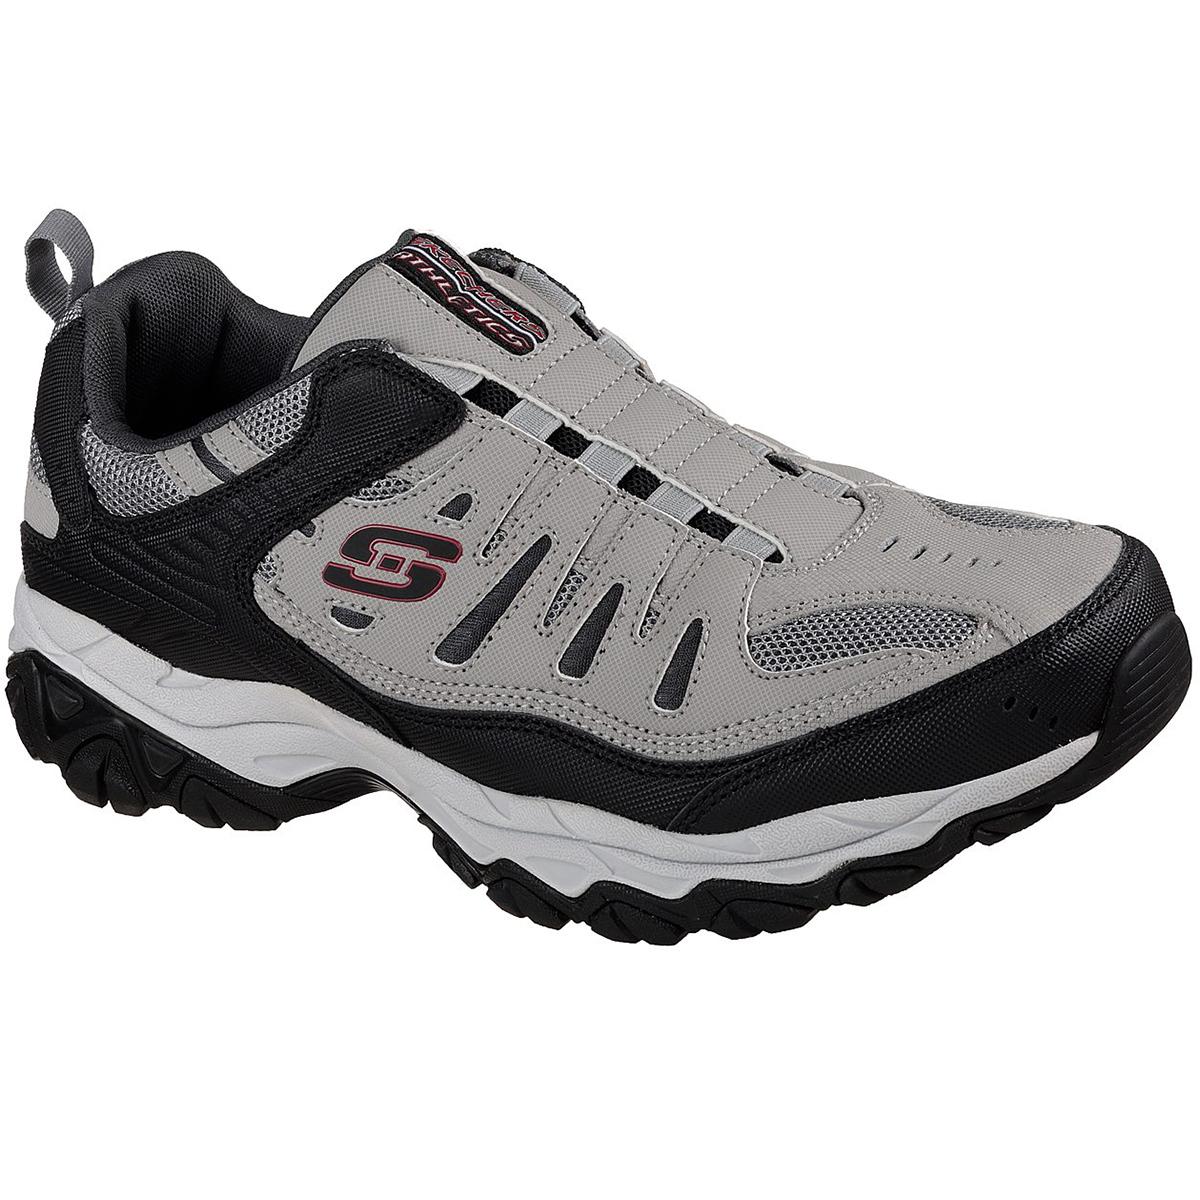 Skechers Men's After Burn-M. Fit Sneakers, Wide - Black, 9